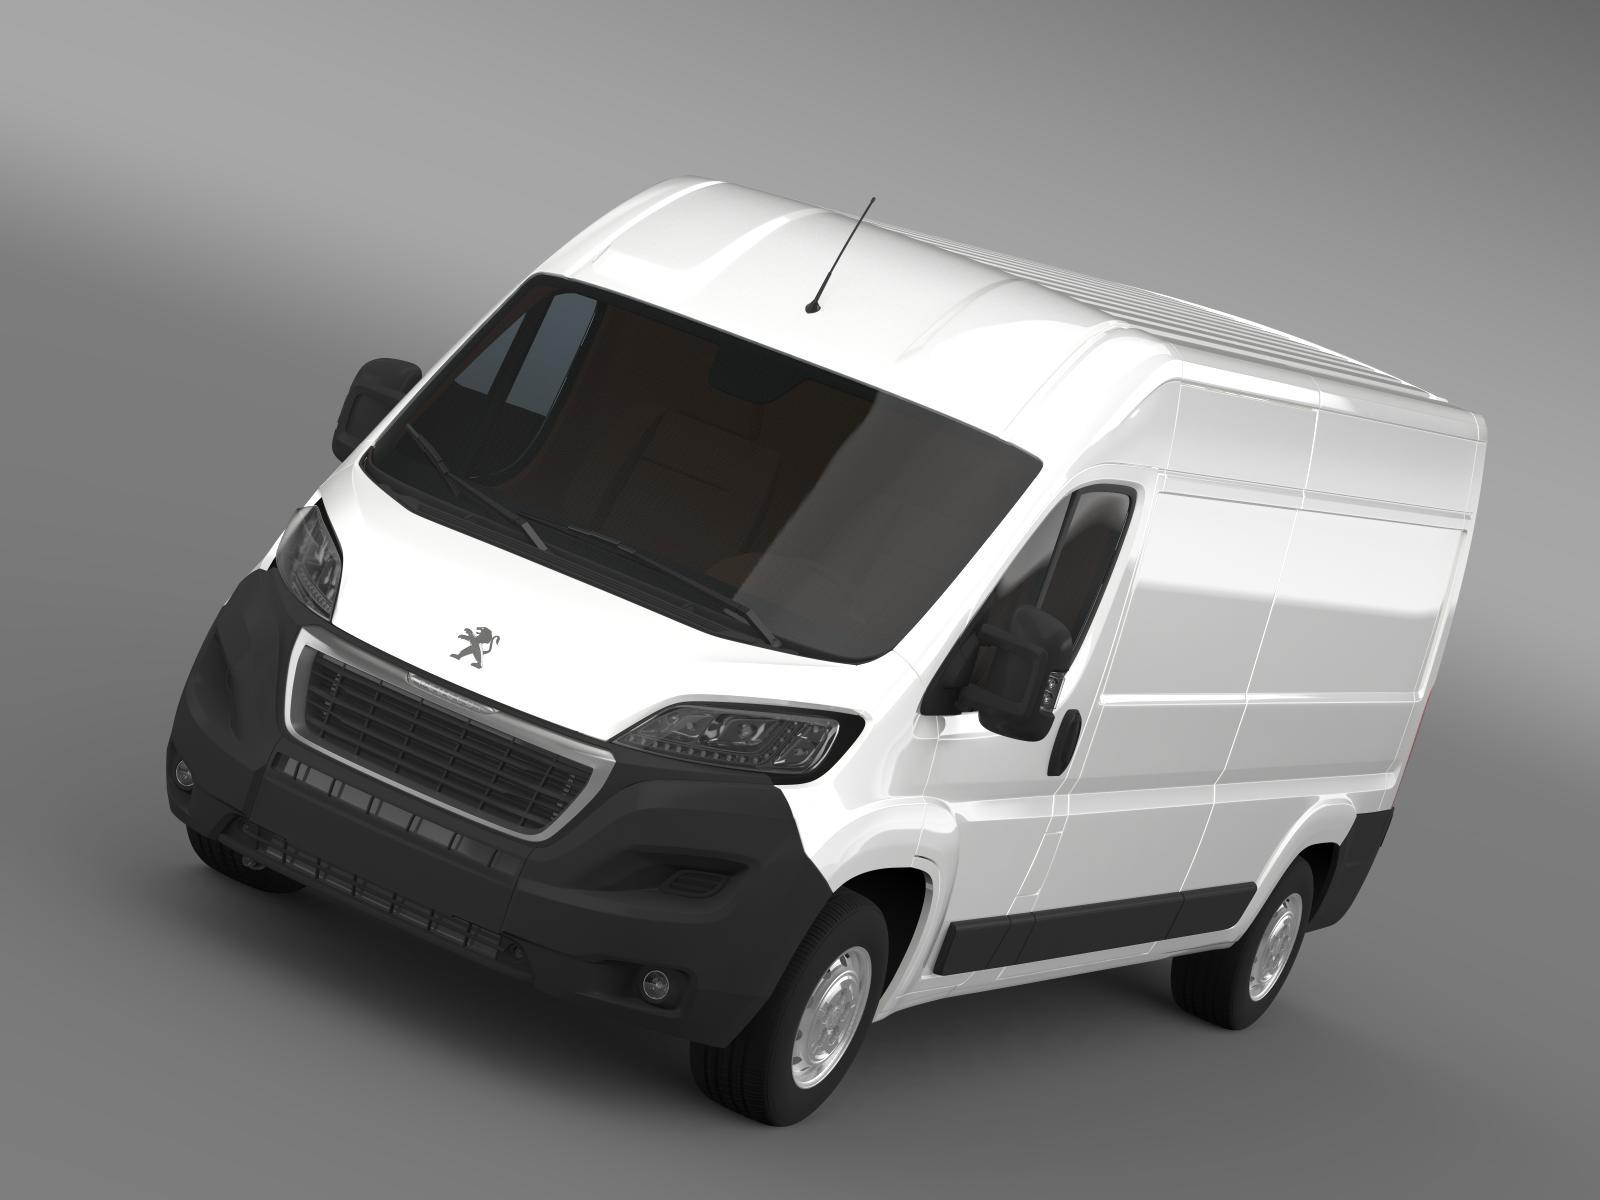 peugeot boxer furgons l3h2 2014 3d modelis 3ds max fbx c4d lwo ma mb hrc xsi obj 203083